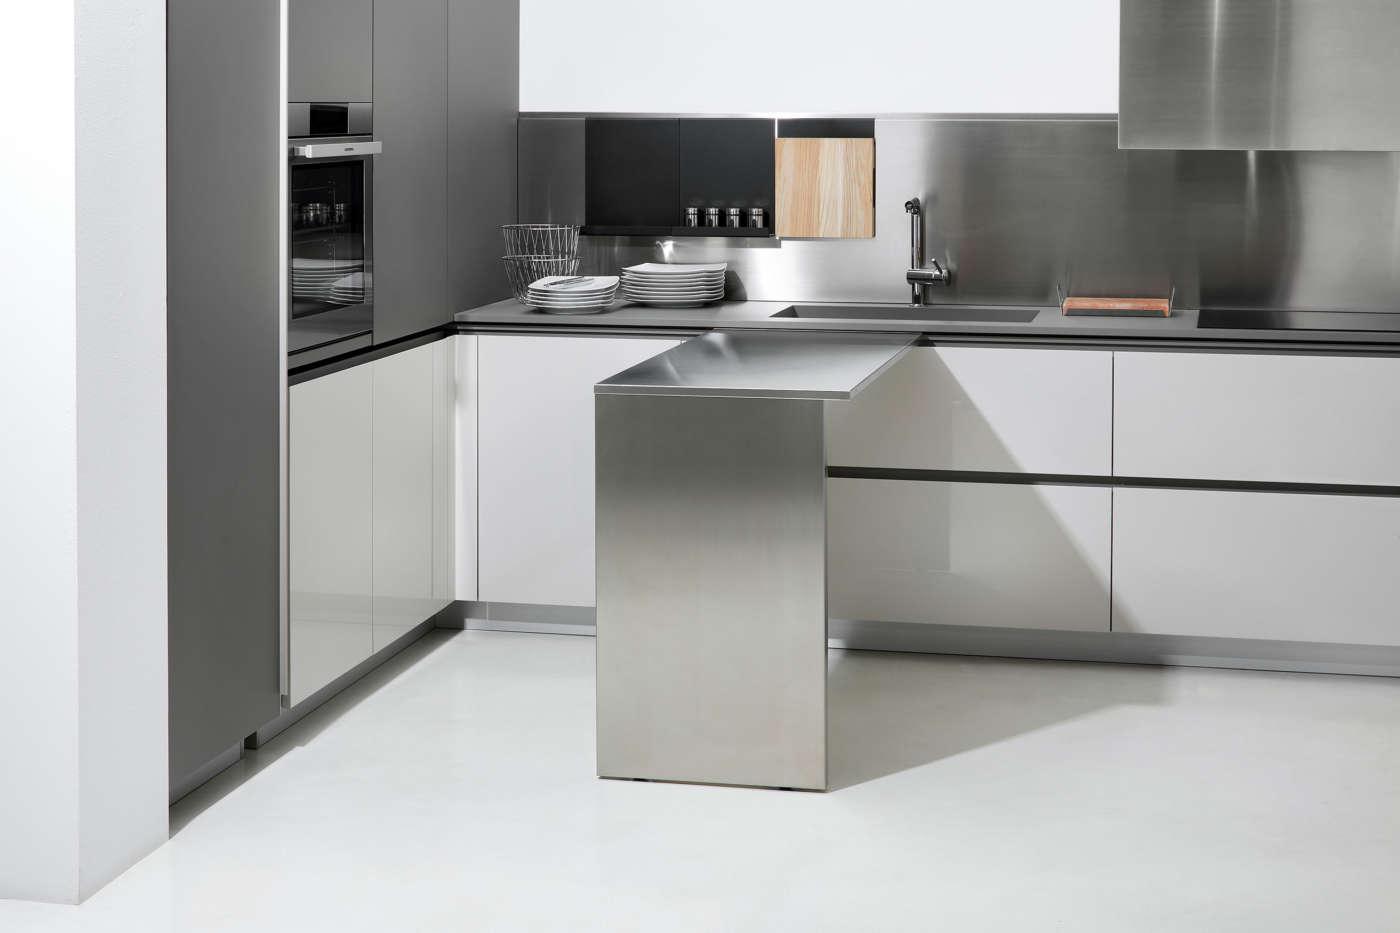 Elmar Soluzioni Per Cucine Efficienti Ambiente Cucina